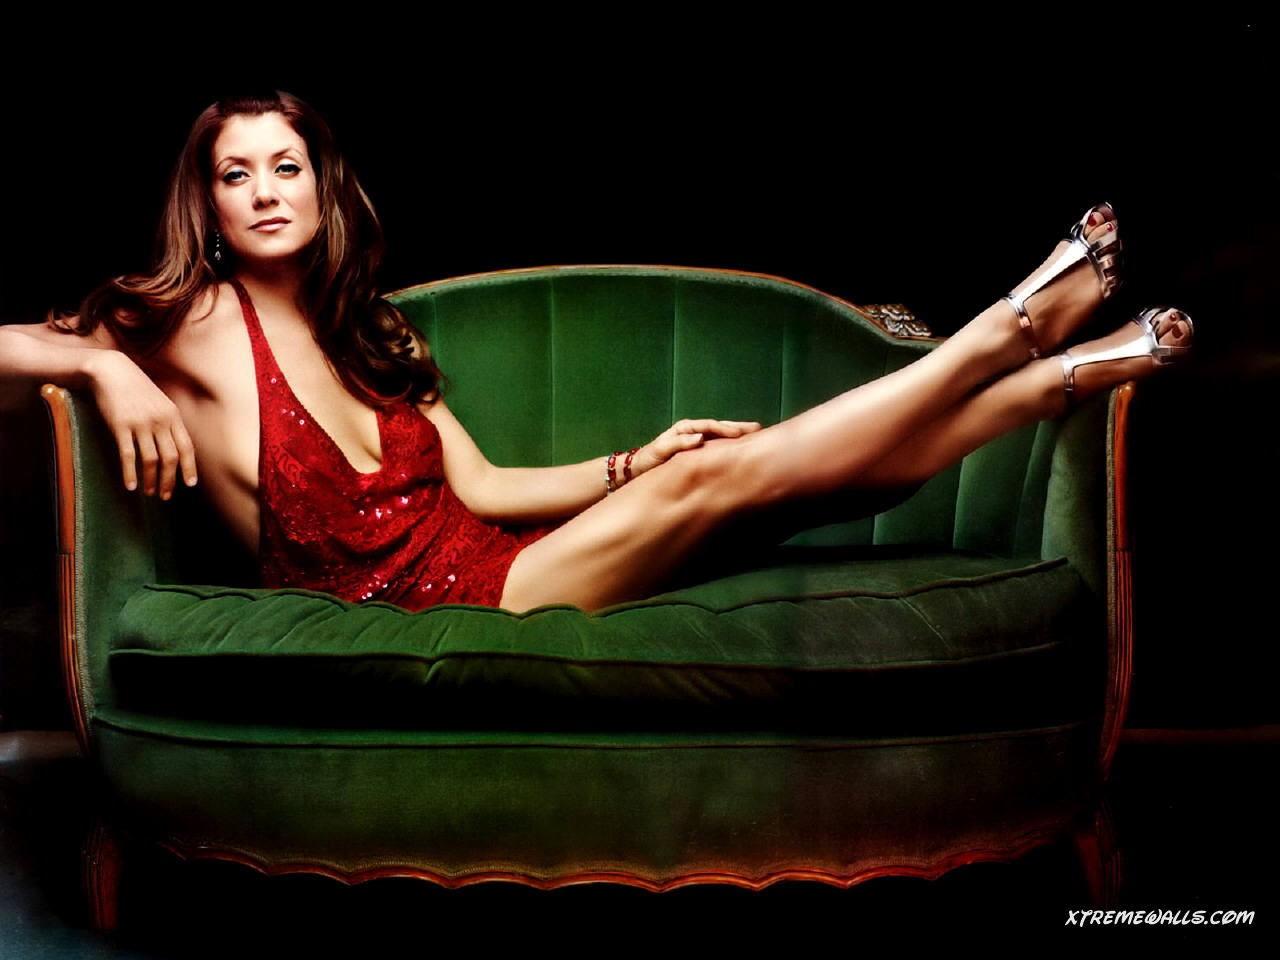 Señoras estupendas. Madurez sexy - Página 3 Kate%2BWalsh8